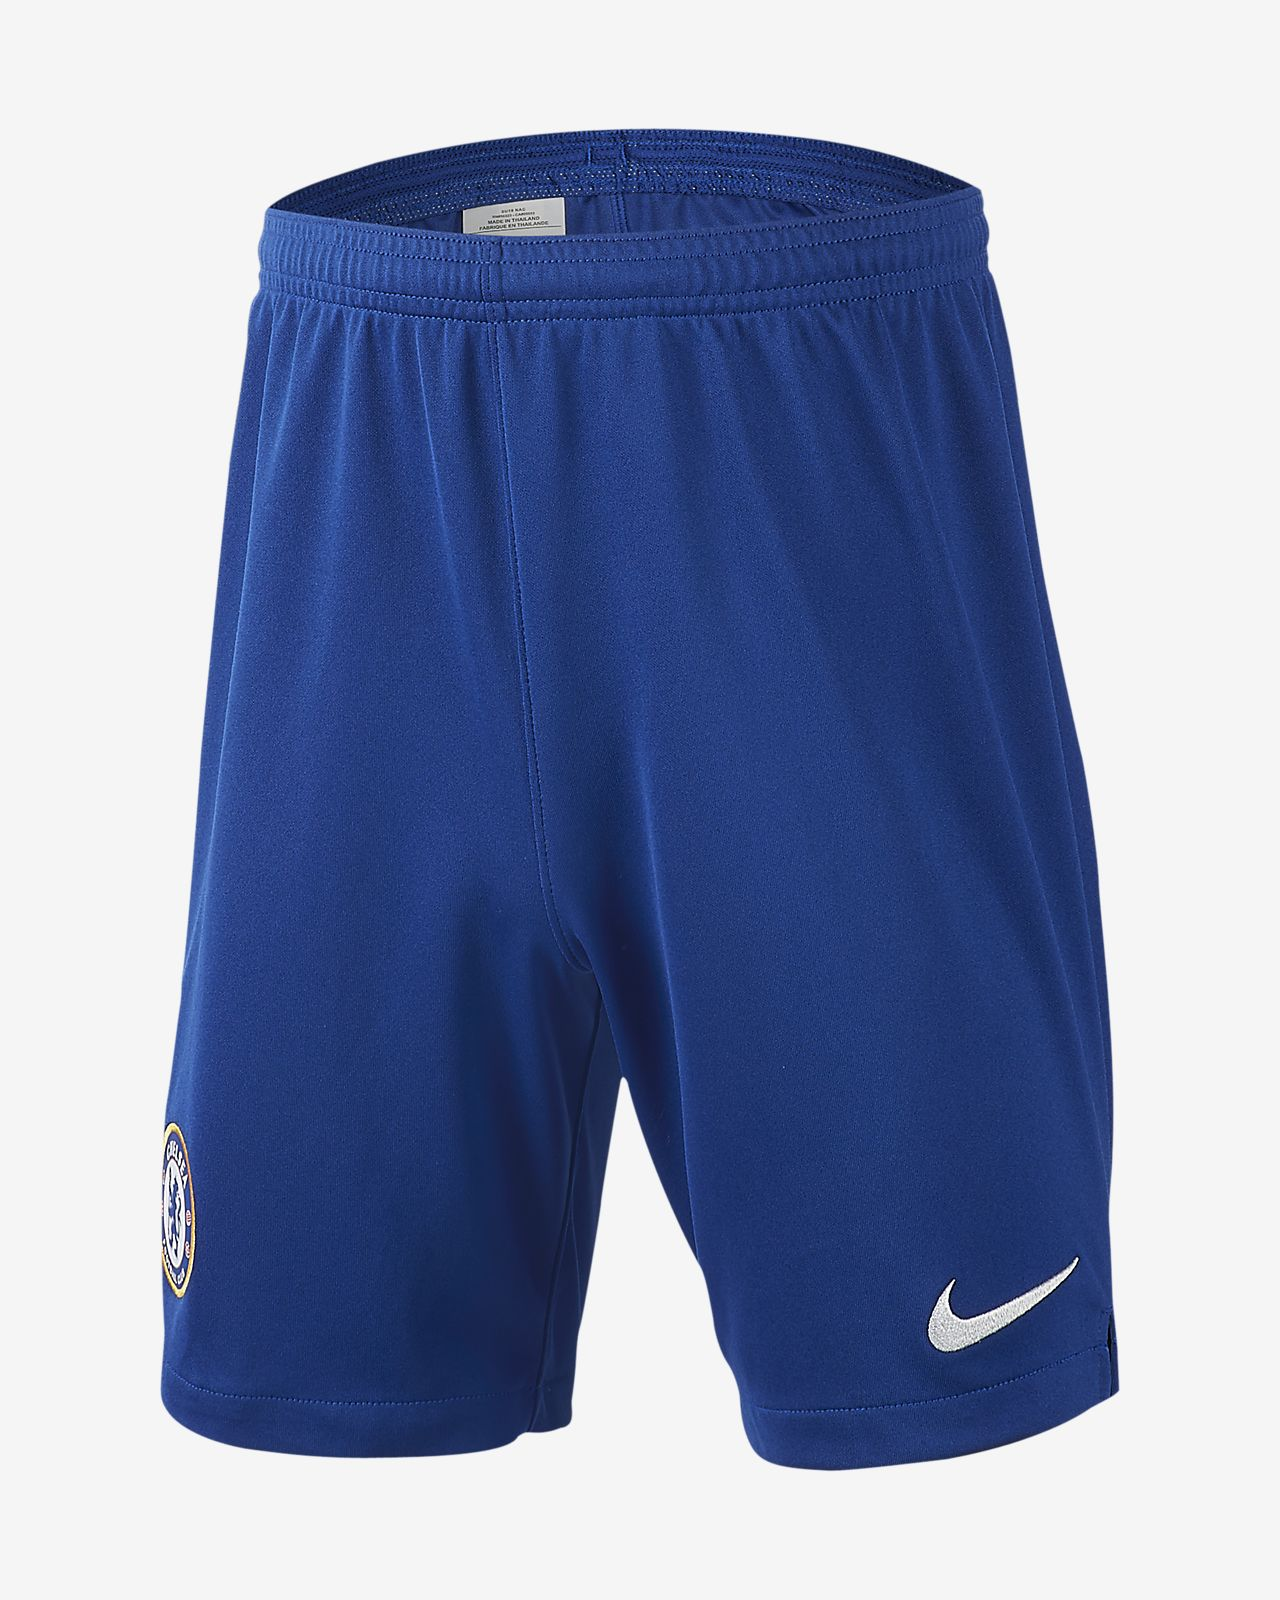 Chelsea F.C. 2019/20 Stadium Home/Away Older Kids' Football Shorts